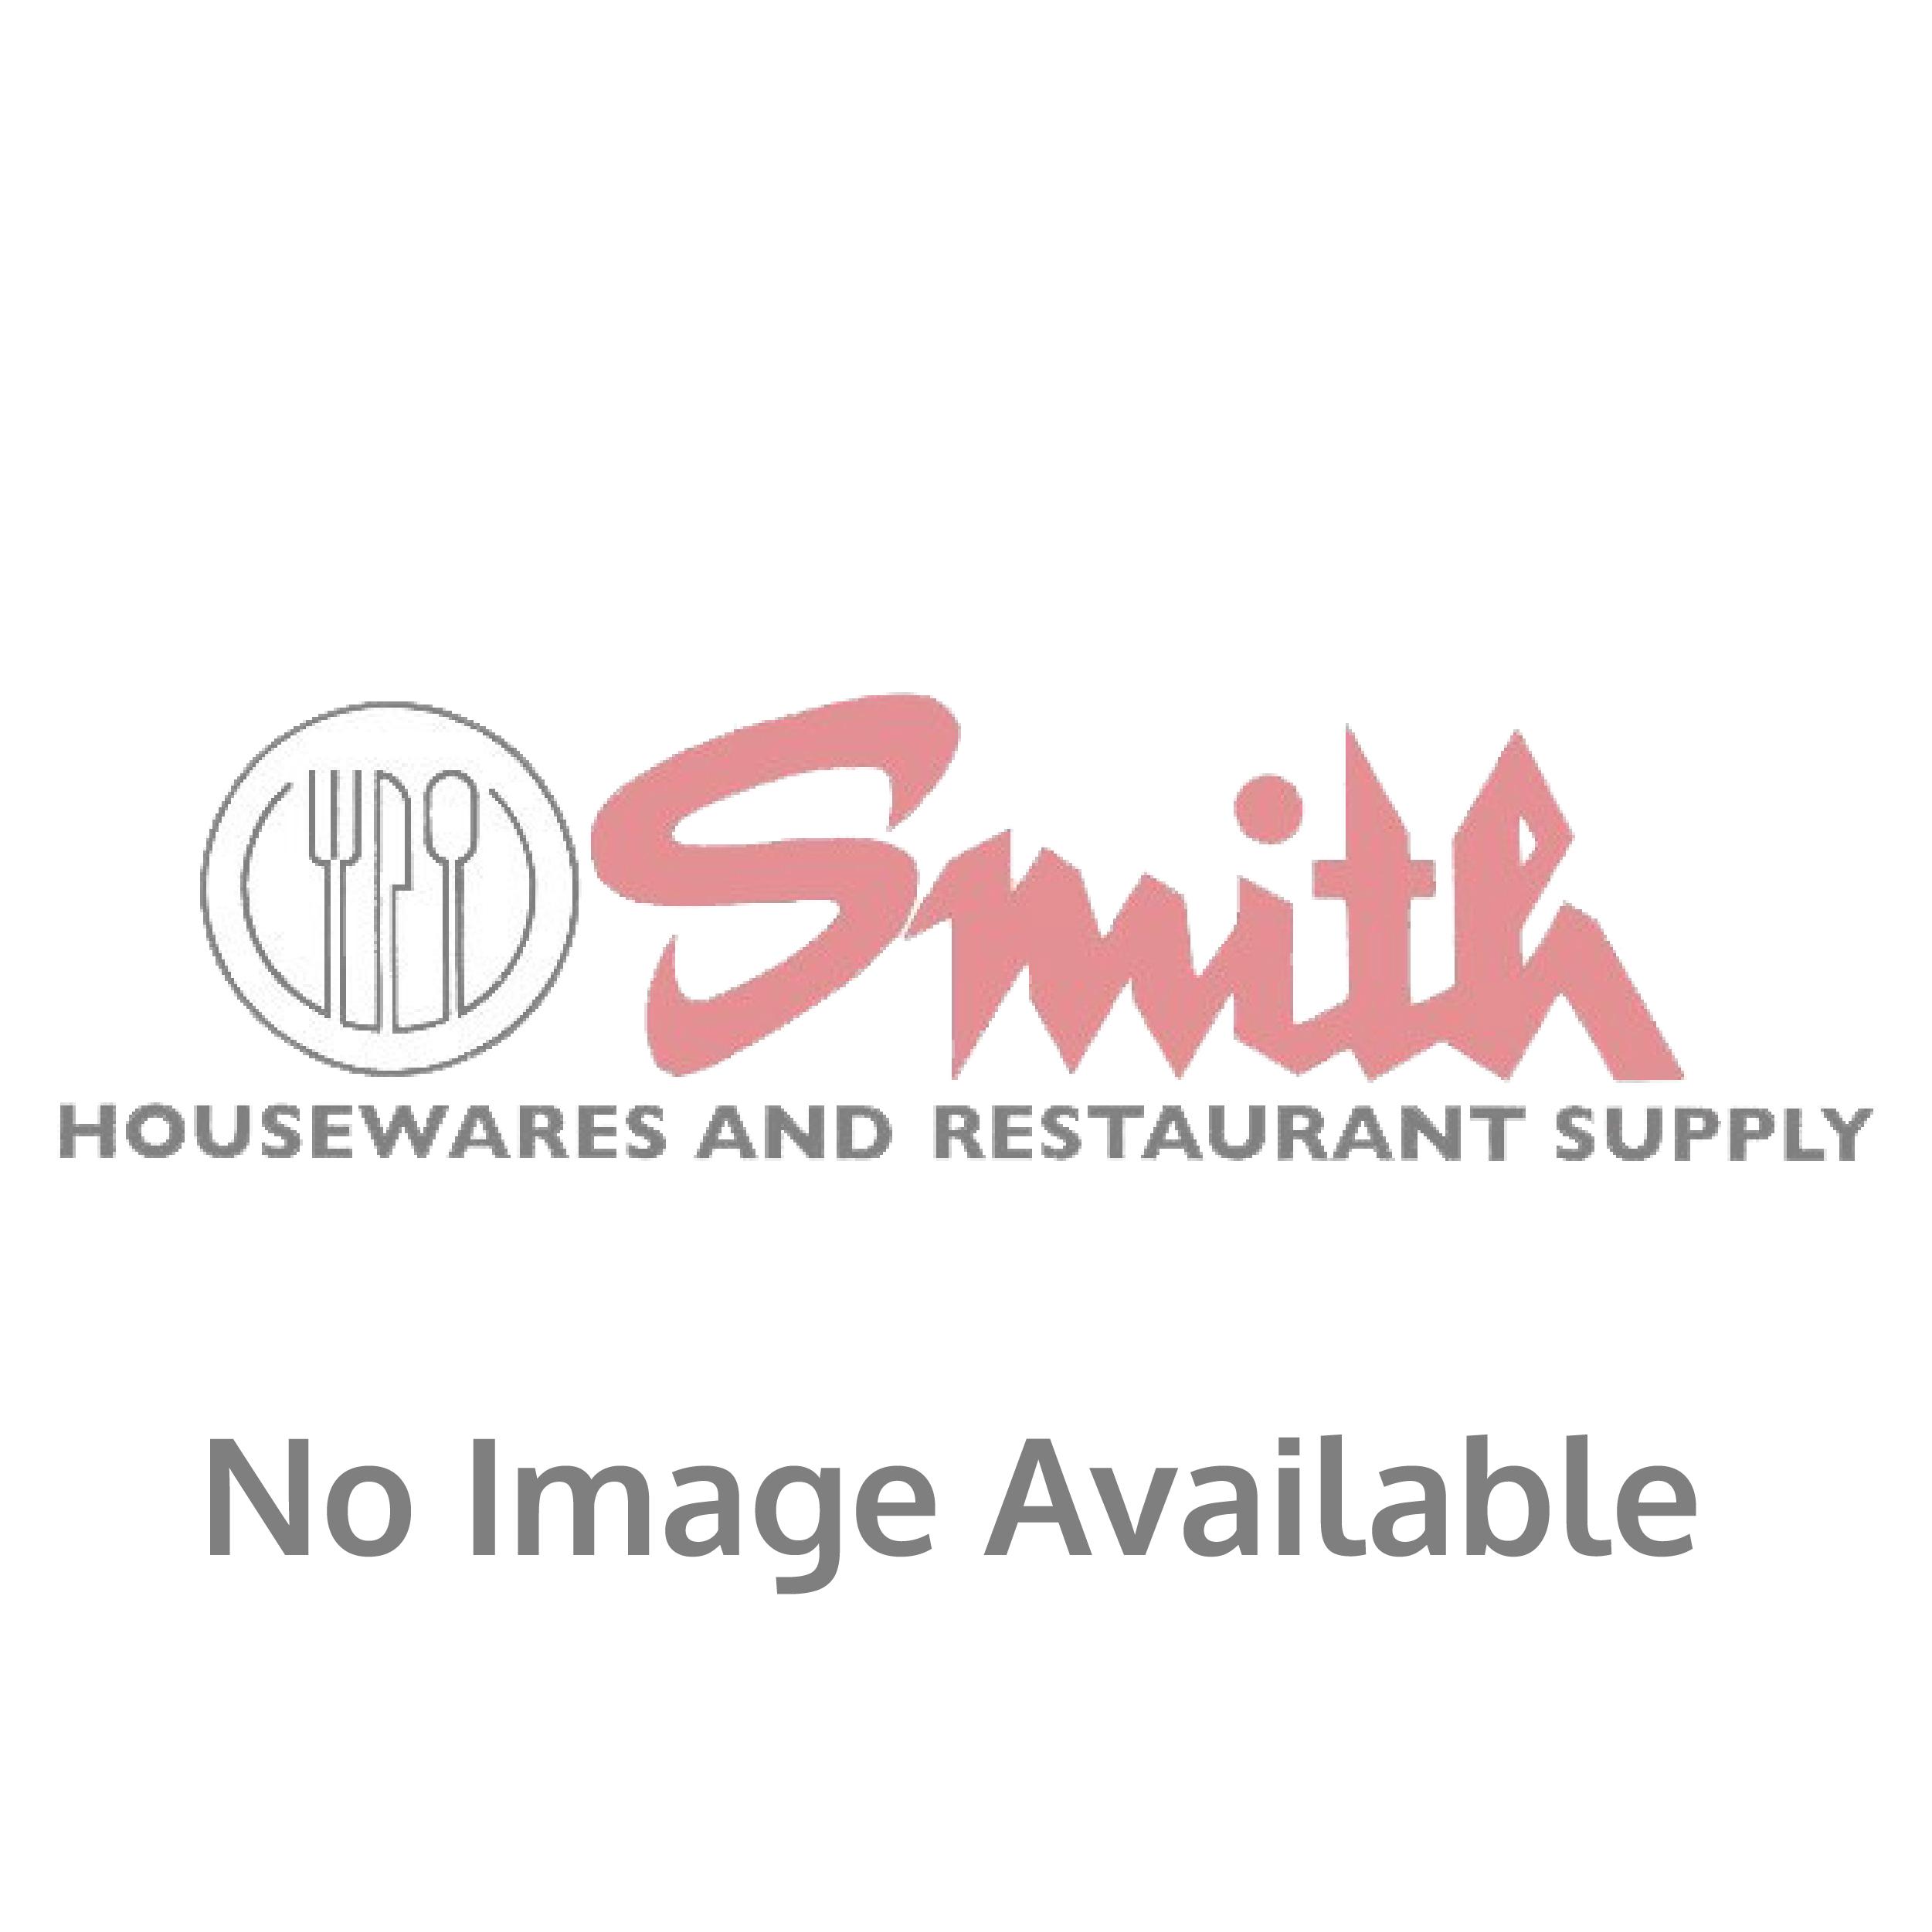 Food warmer, Countertop, Electric, Full Size